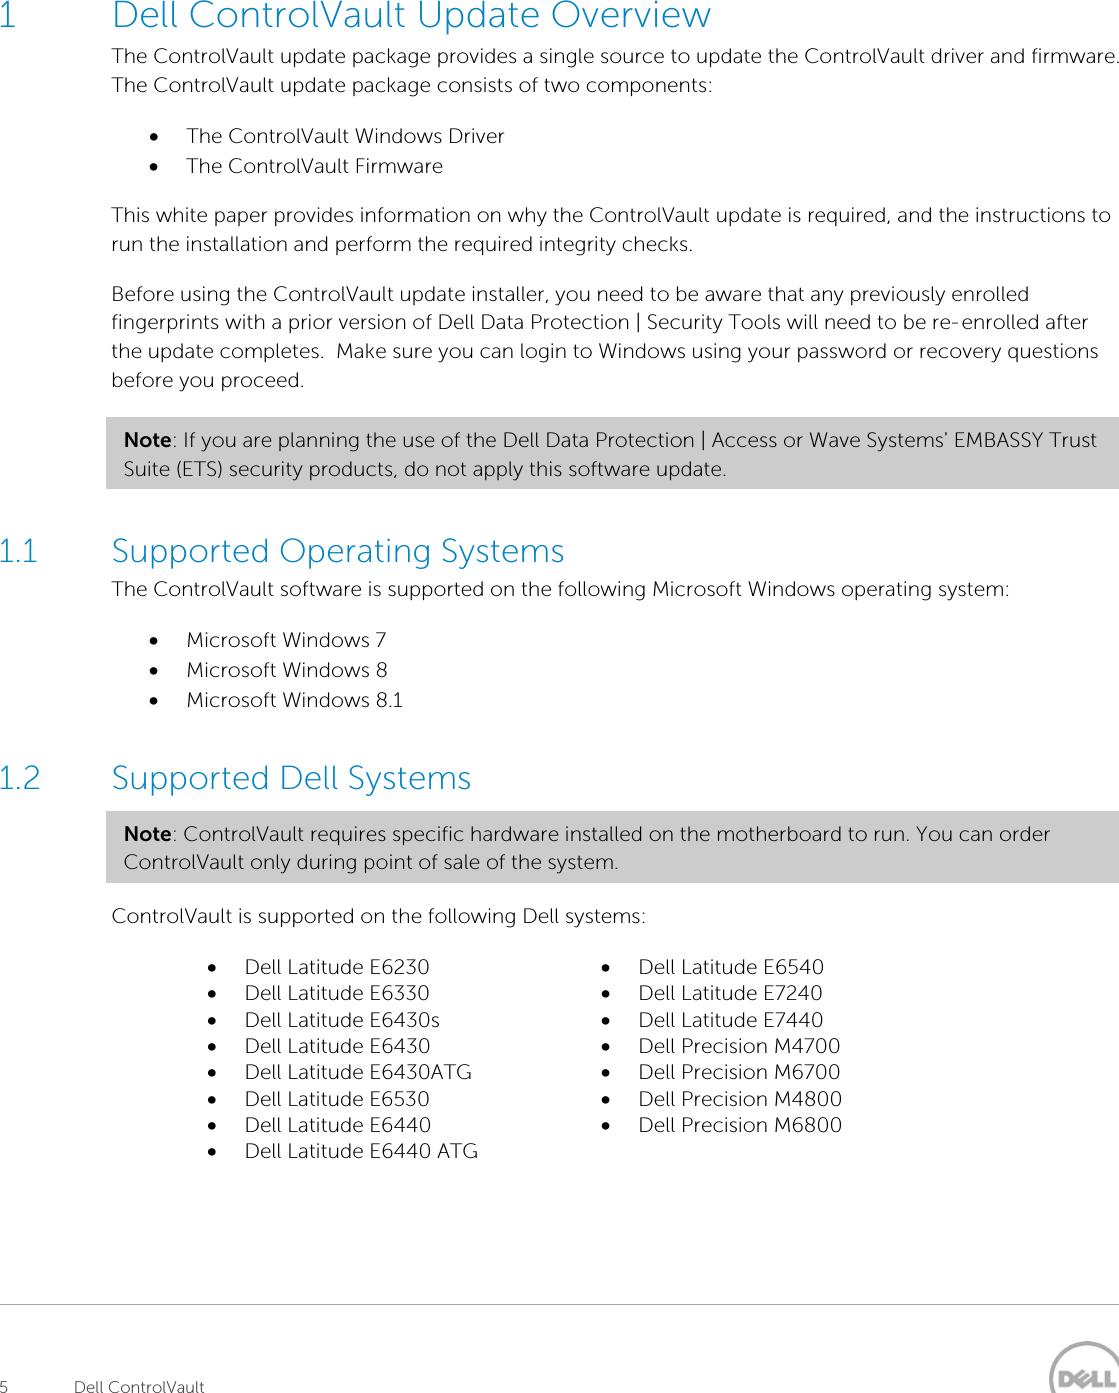 Dell Latitude E7440 Mid 2013 Troubleshooting ControlVault